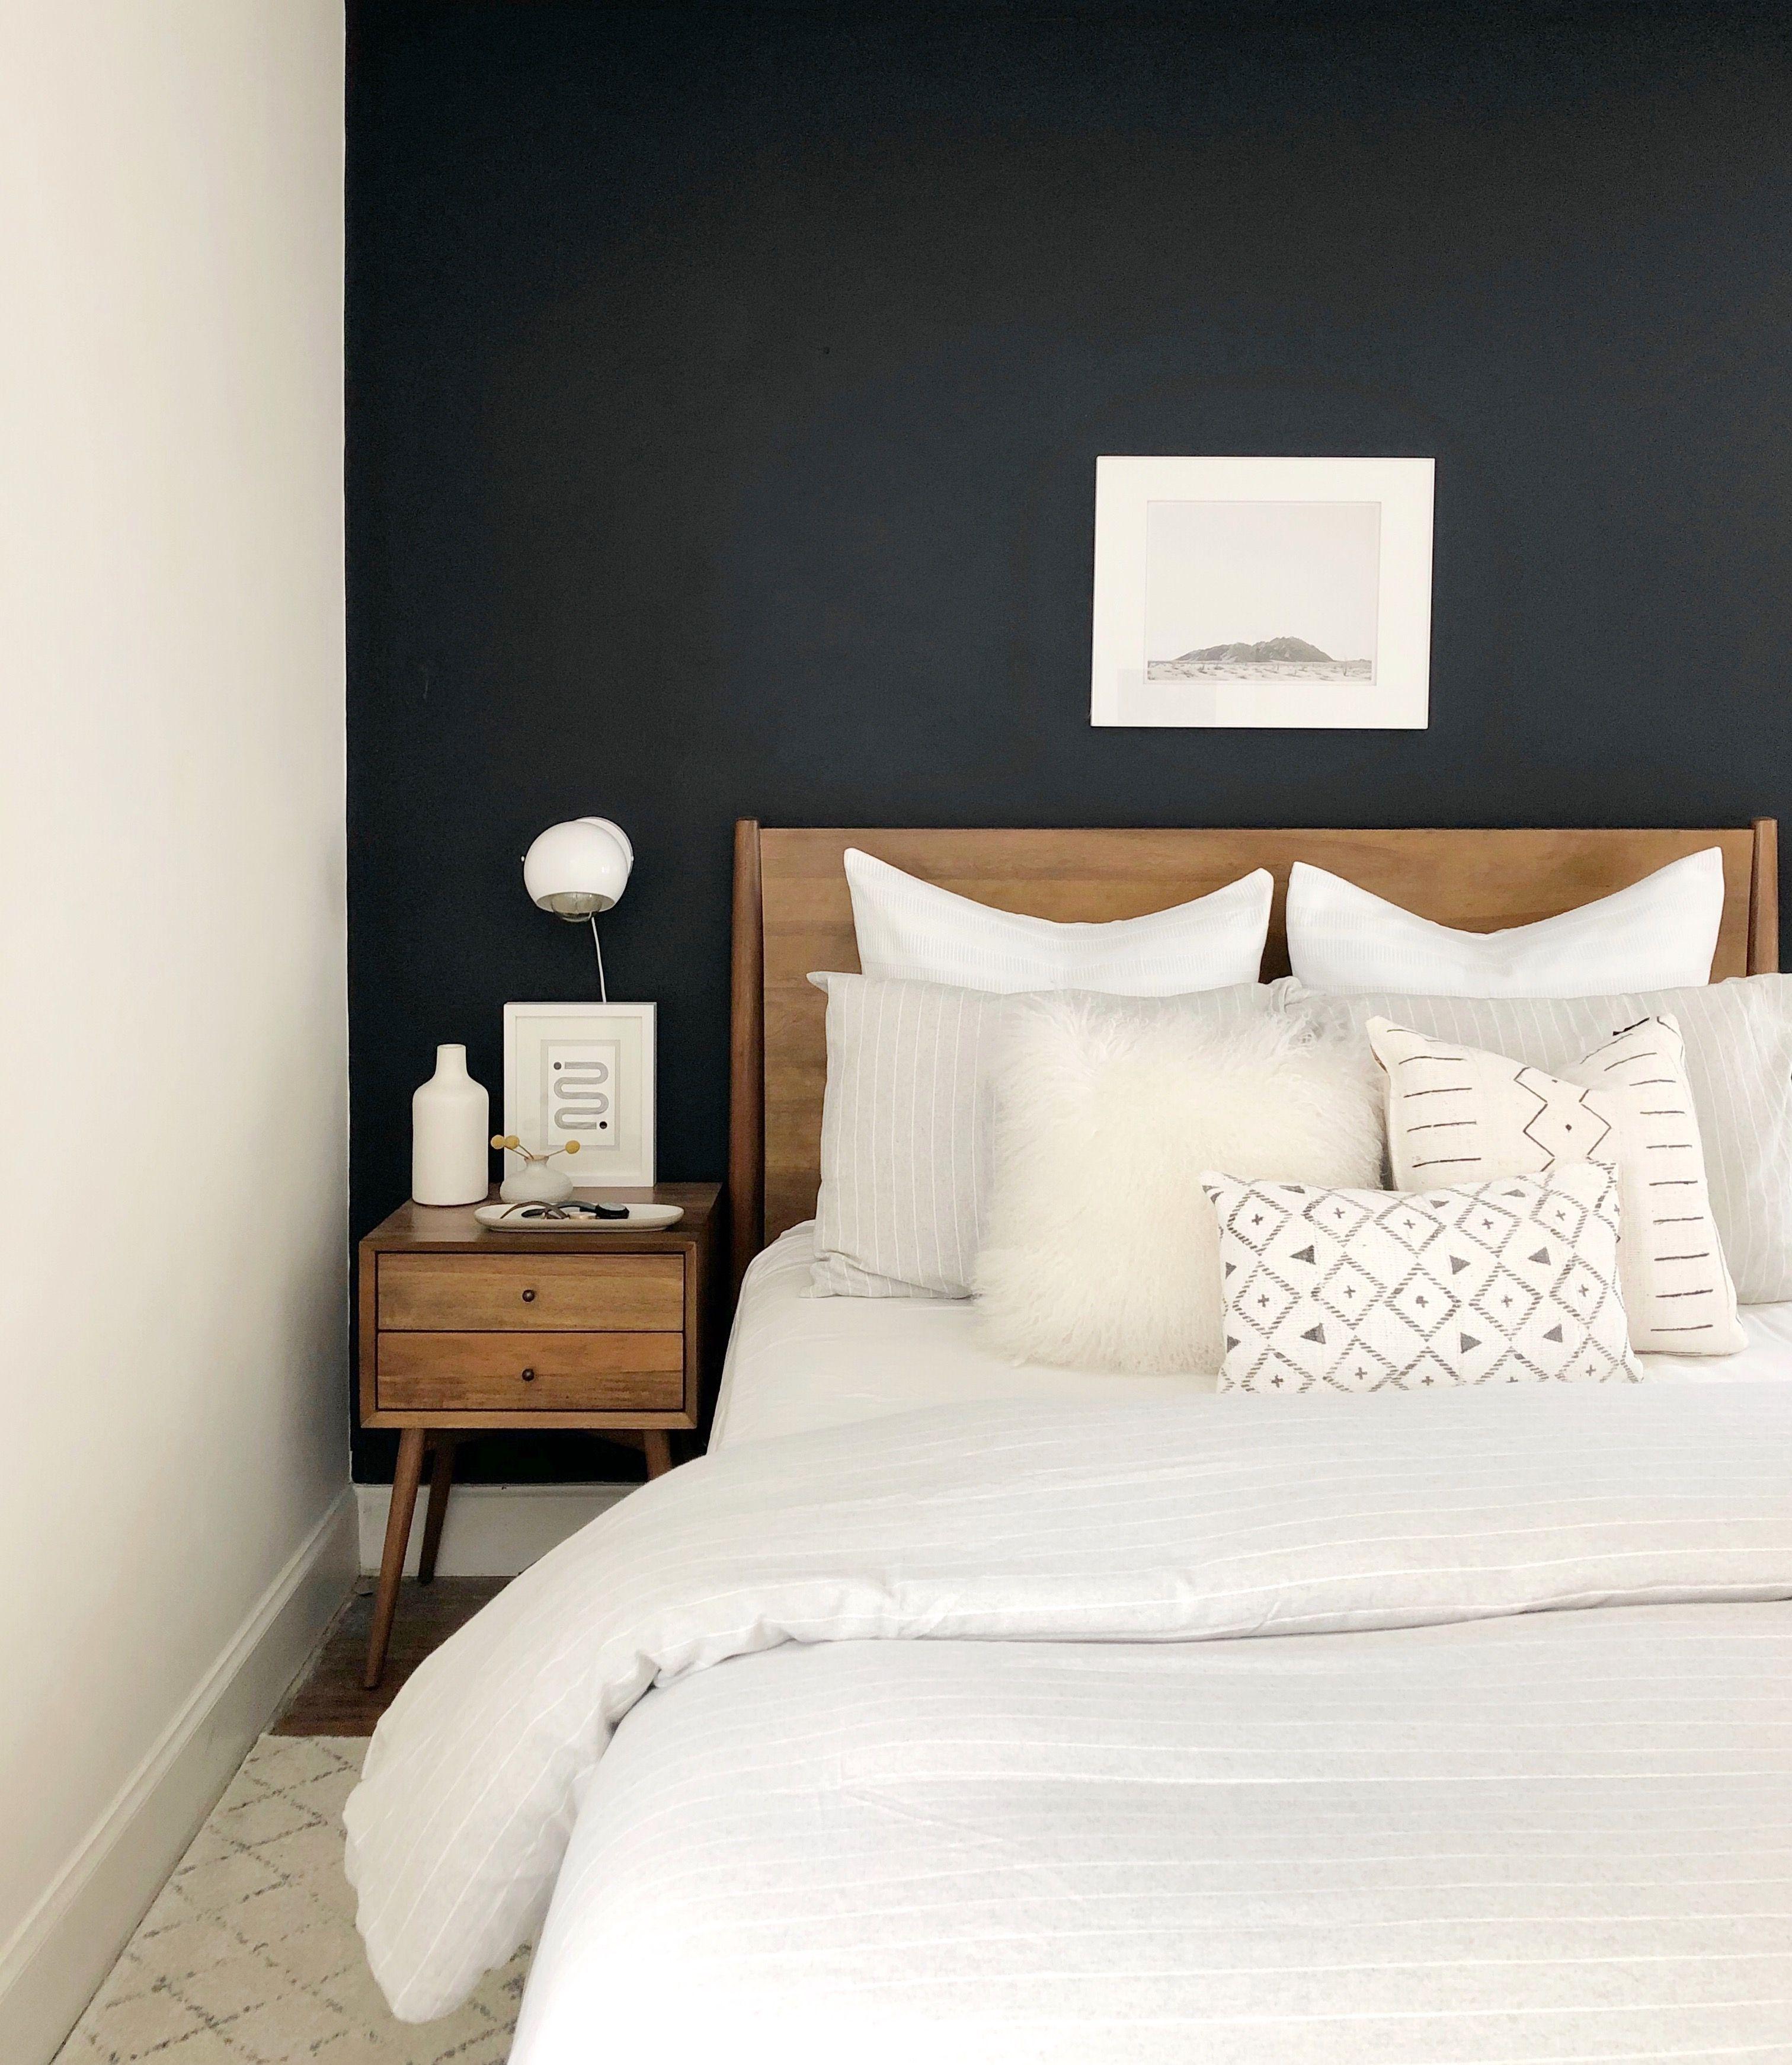 Budget Bedroom Refurbish - June, 10  Home decor bedroom, Small